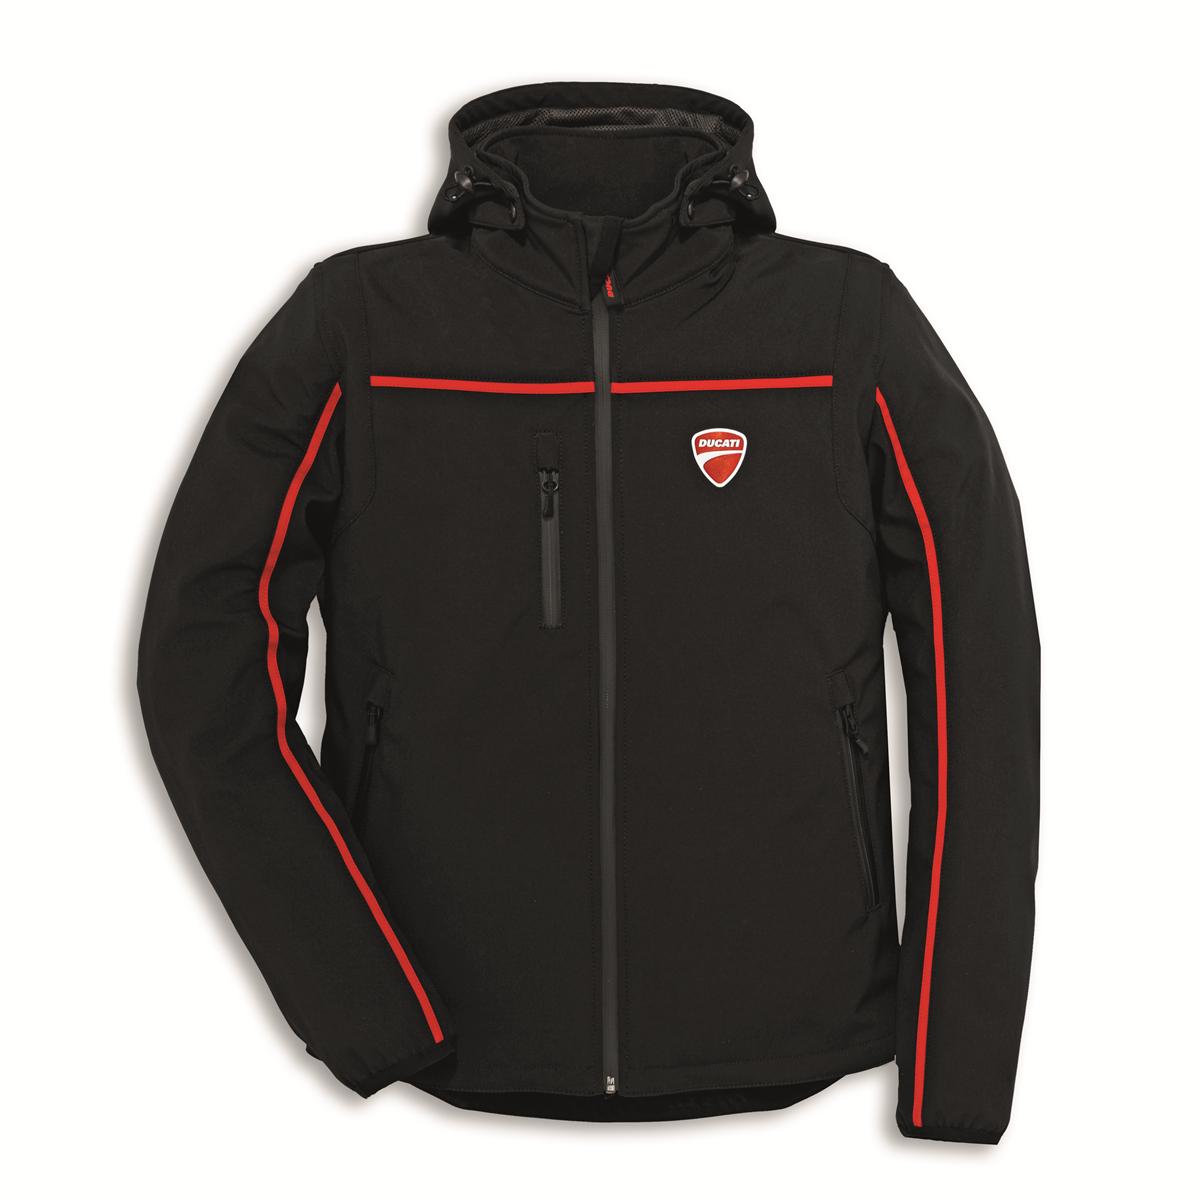 Ducati Redline Ladies Fabric Jacket